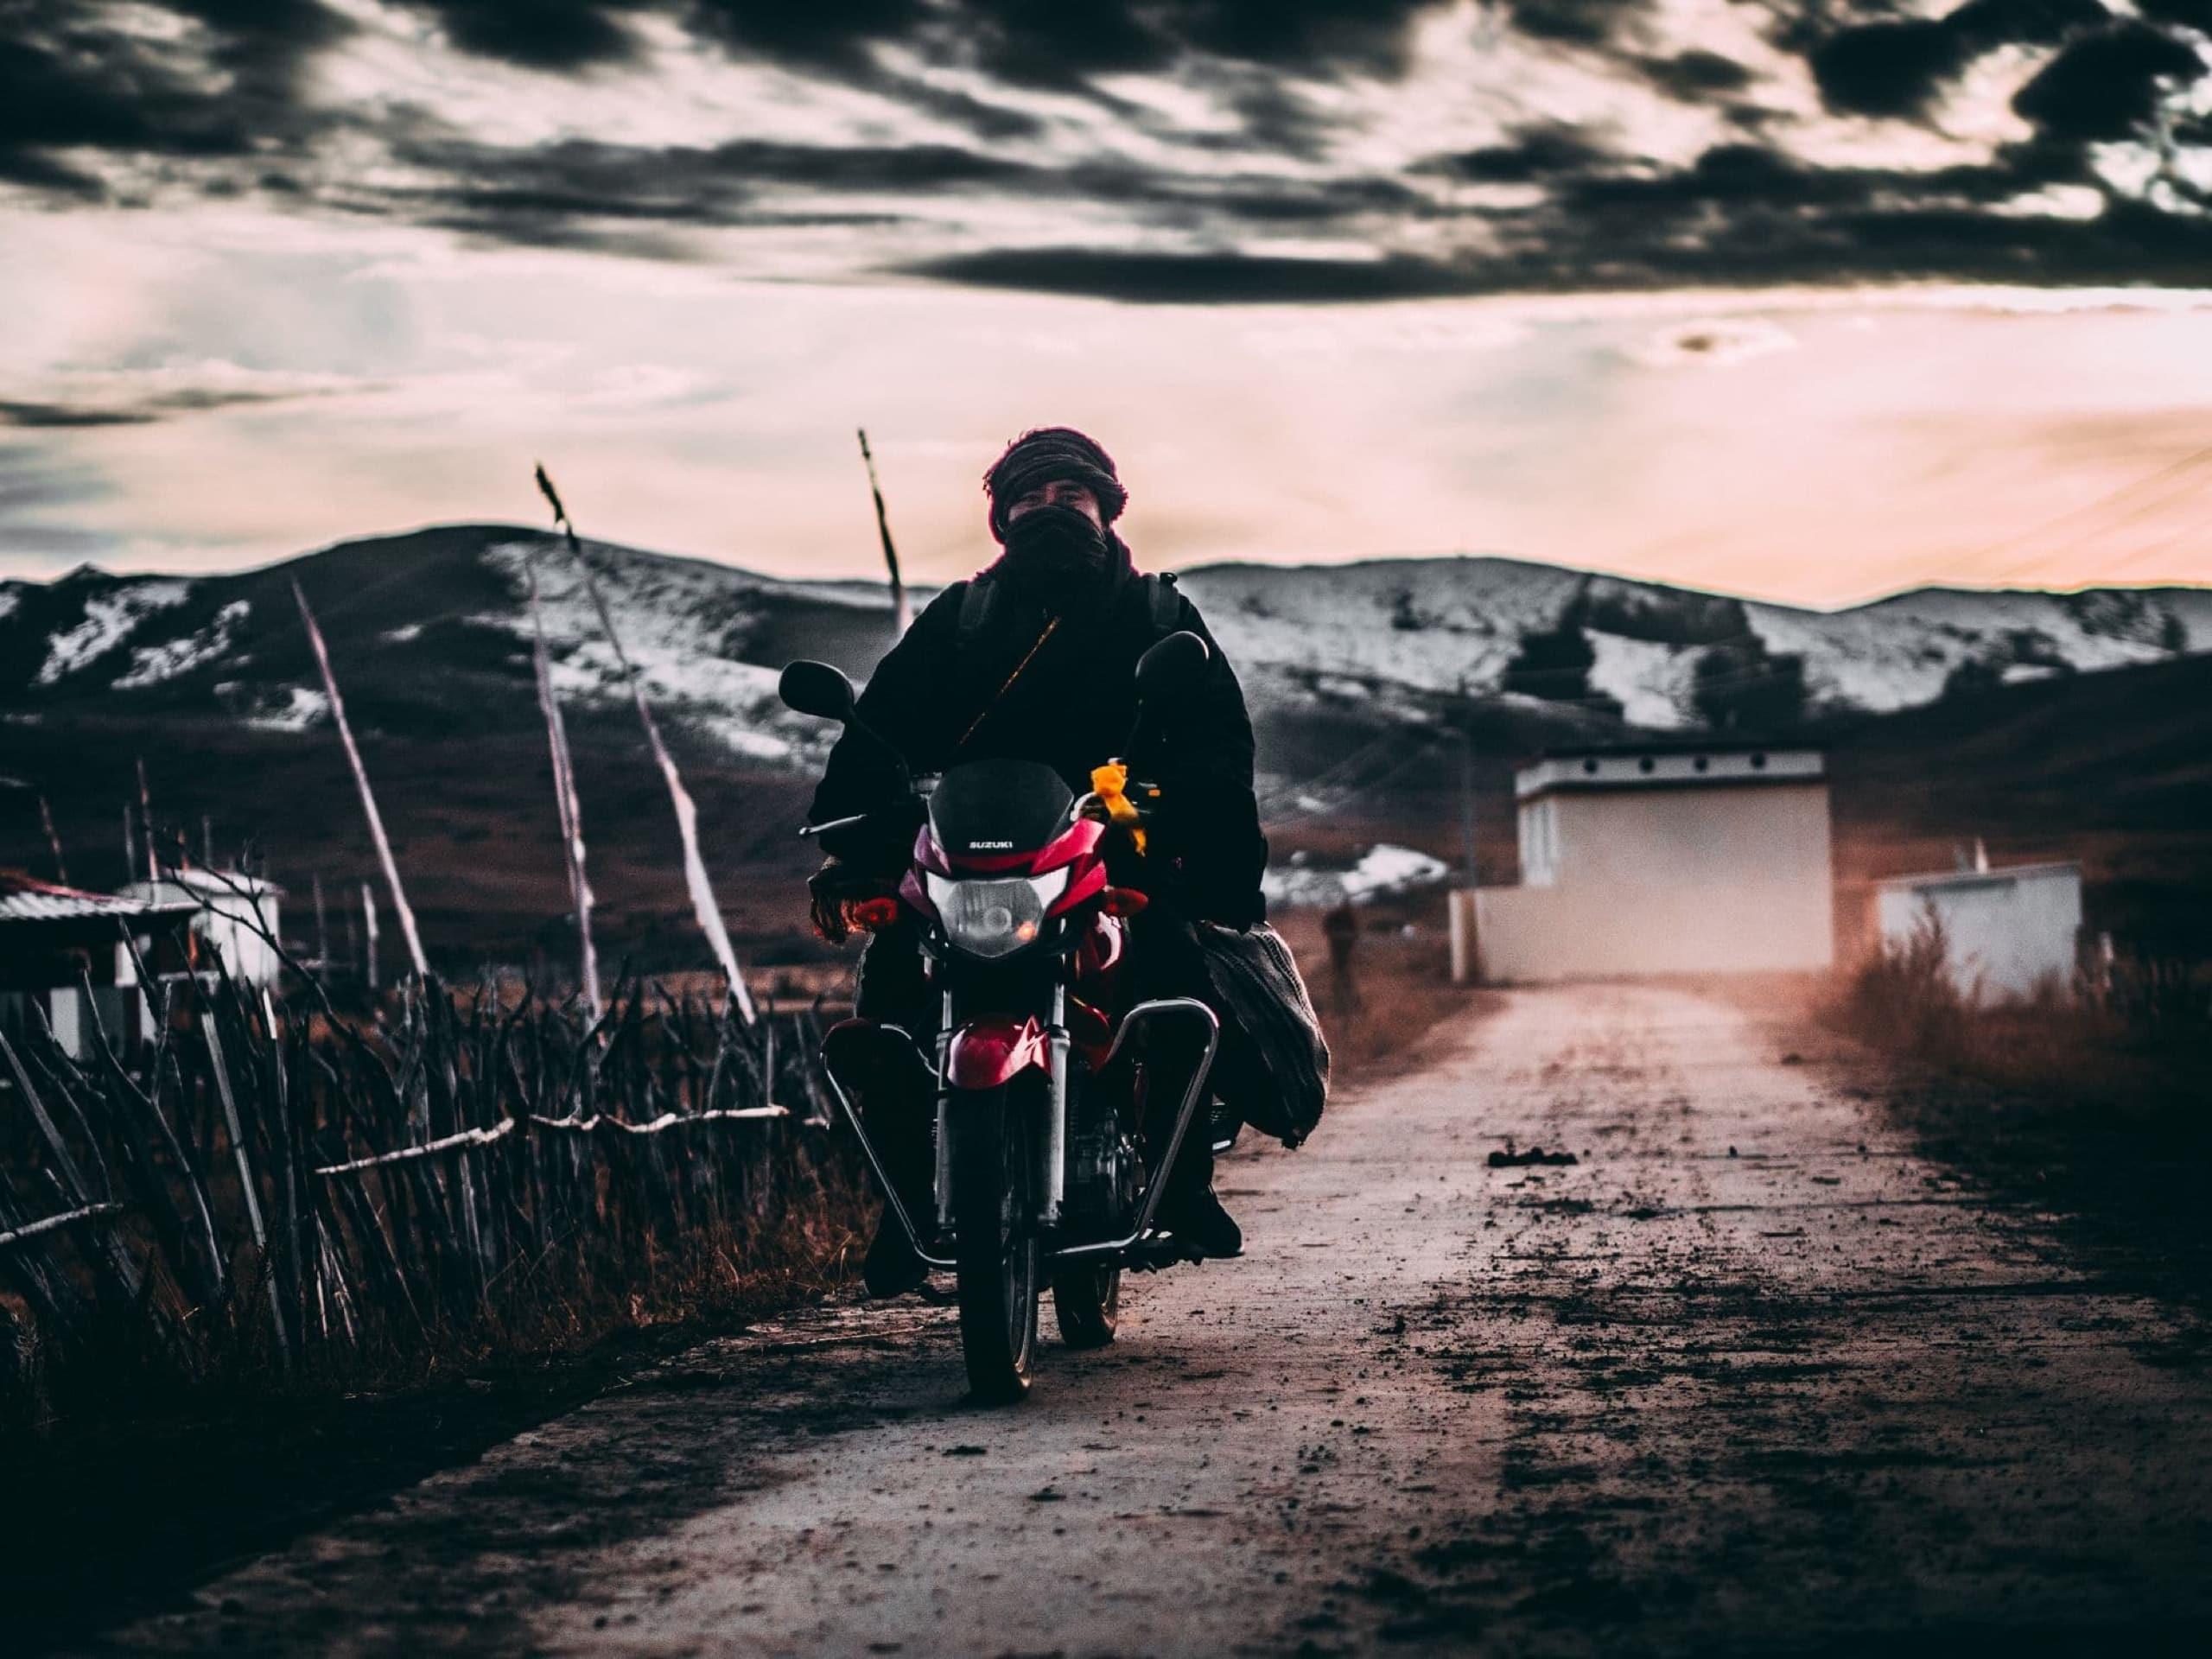 Tibetan winter